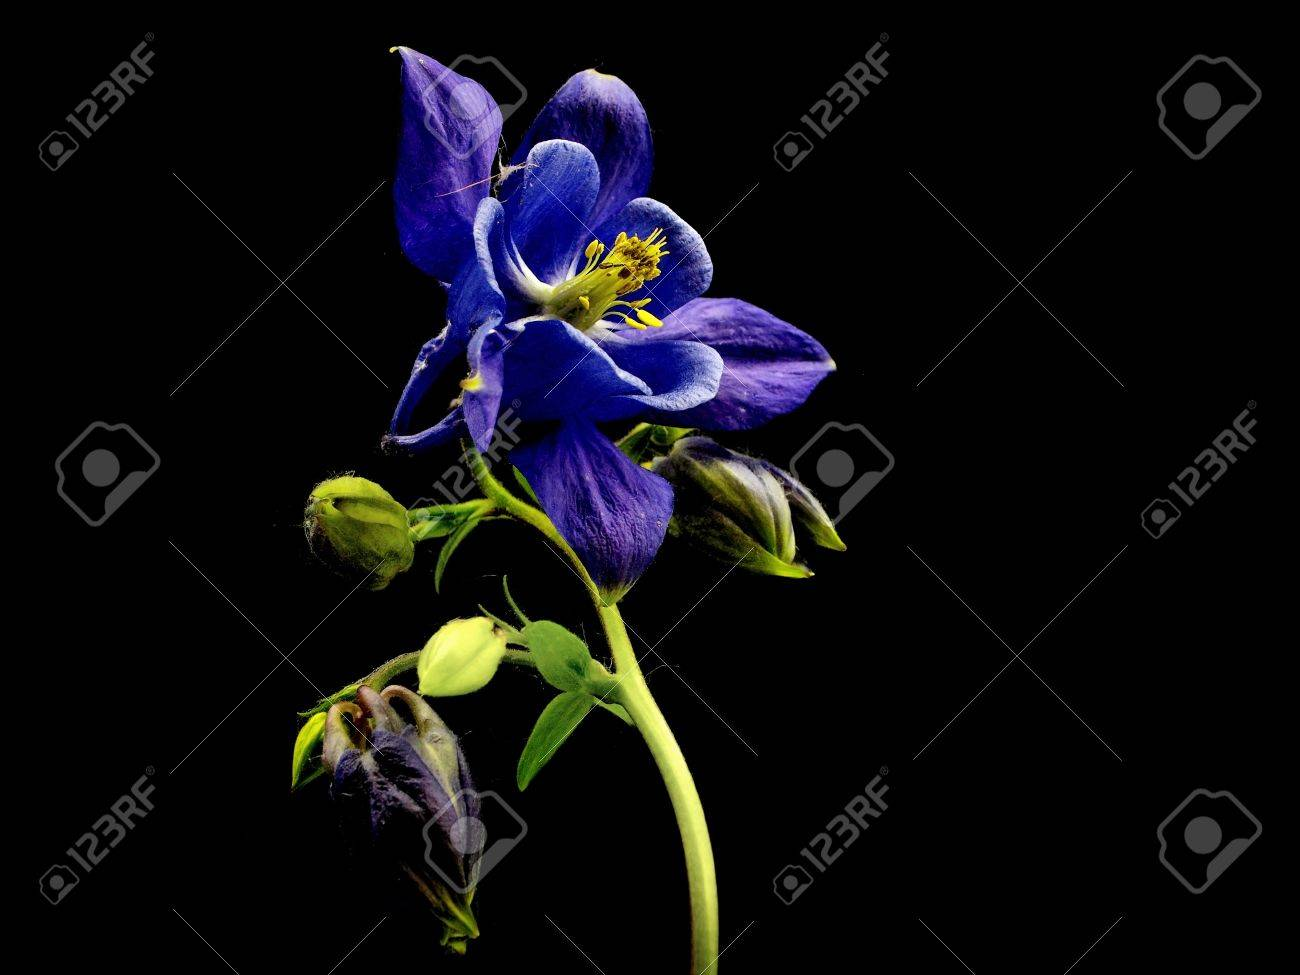 Blue columbine aquilegia flowers on a black background stock photo blue columbine aquilegia flowers on a black background stock photo 11006856 izmirmasajfo